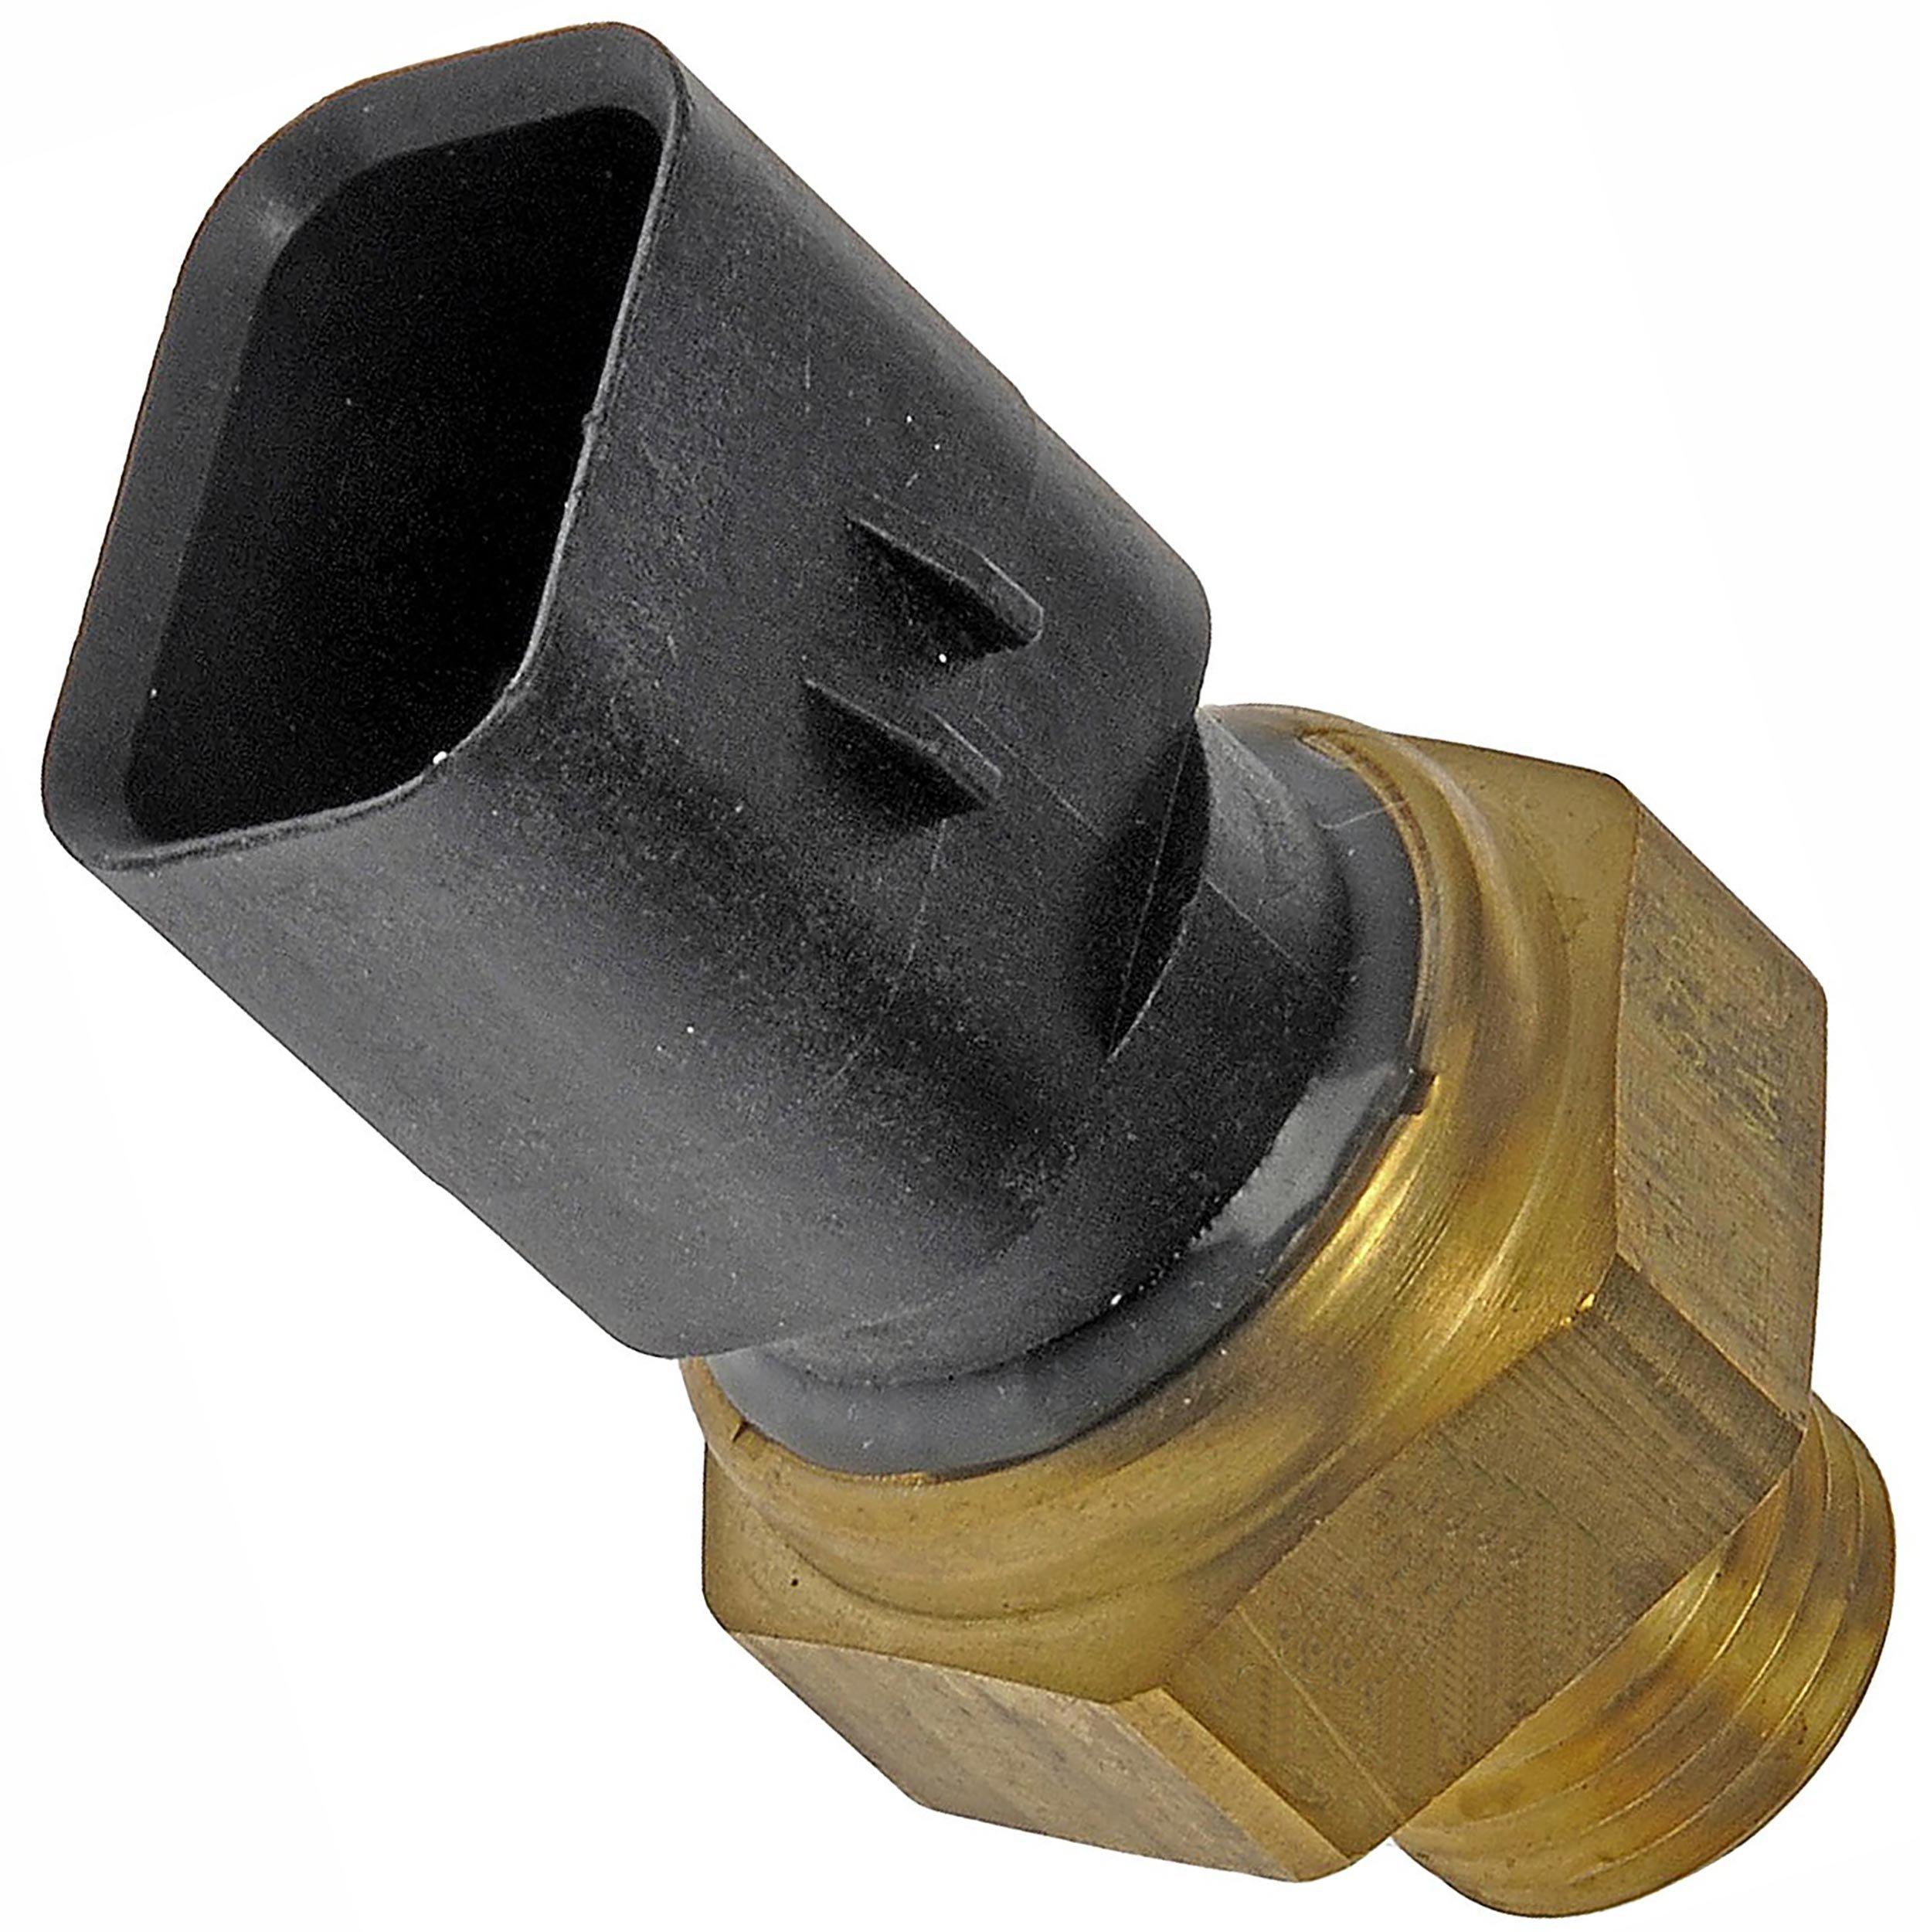 APDTY 138948 Turbocharger Inlet Pressure Sensor Fits Select 2005-2009 Freightliner/International/Kenworth/Peterbilt/Sterling Truck/Western Star (Replaces 2482162, 2746717) by APDTY